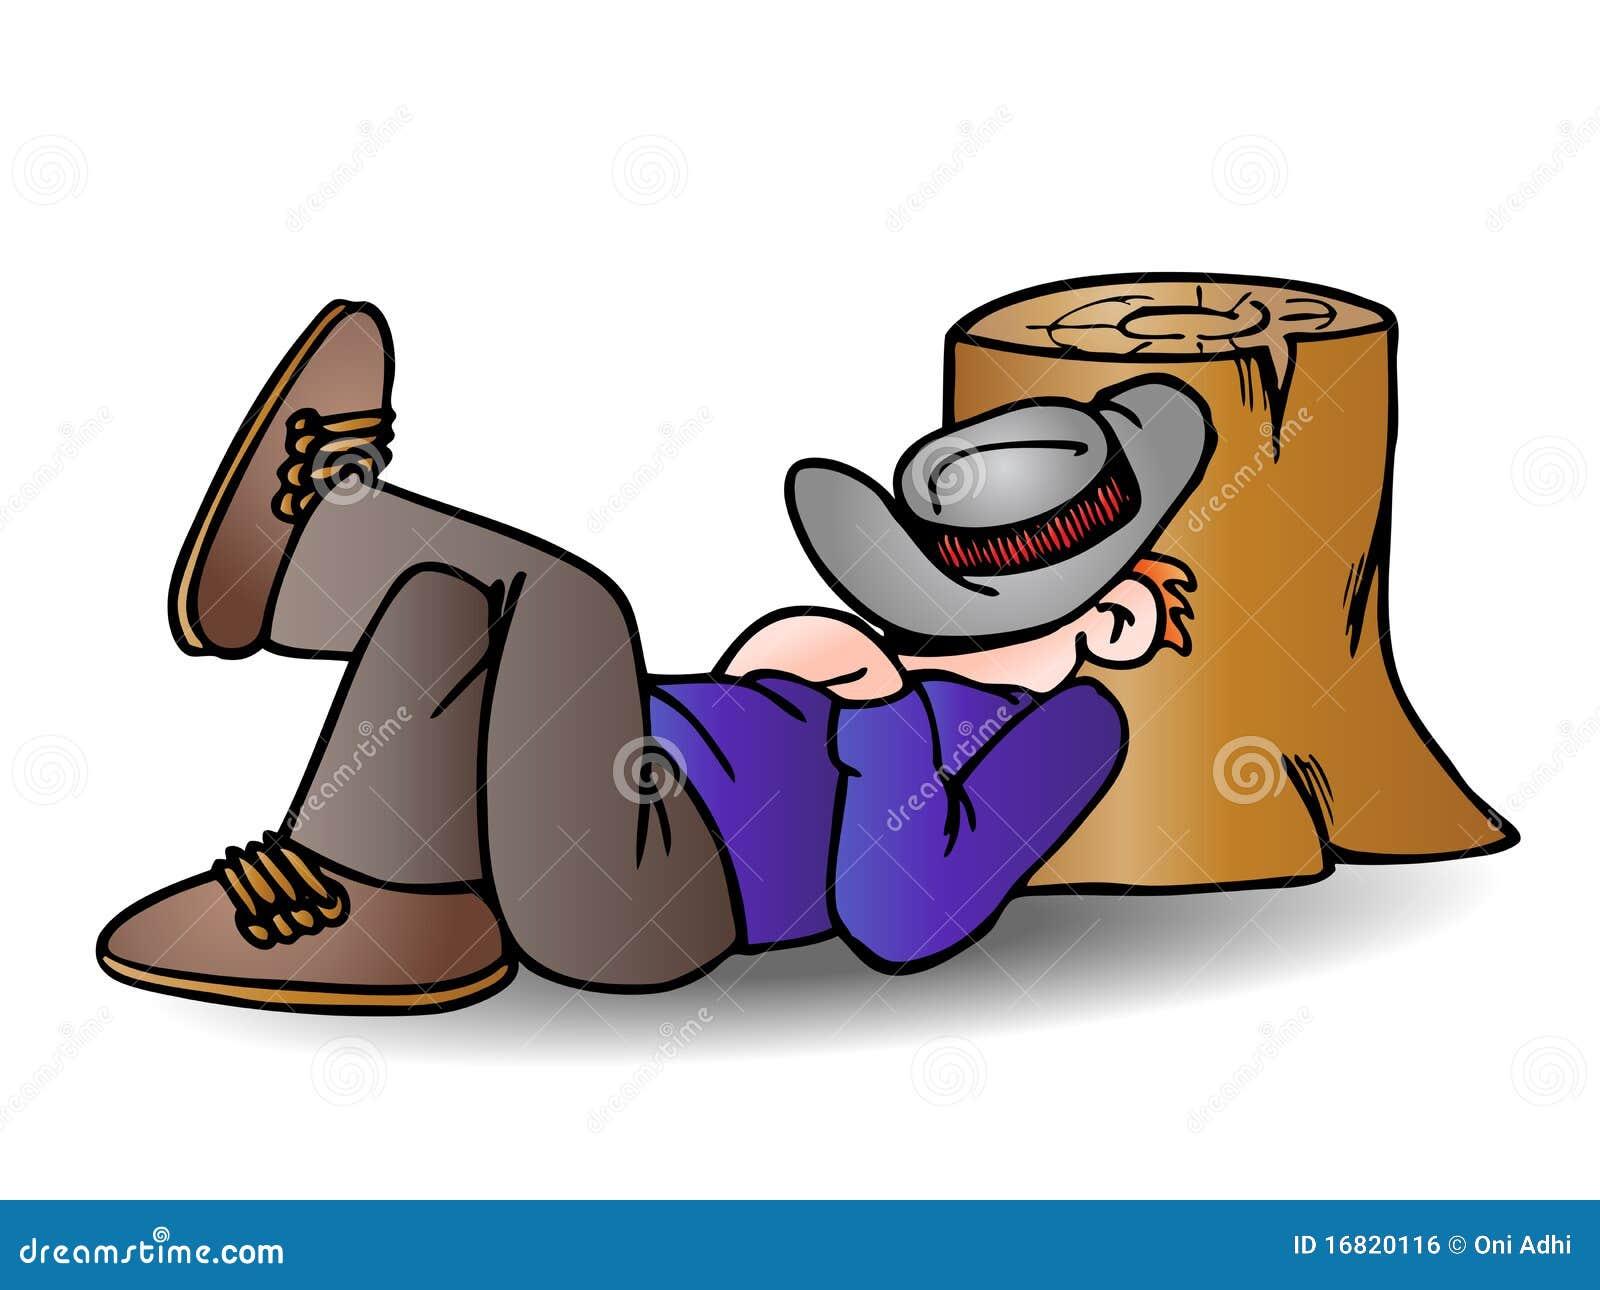 lazy royalty free stock image image 16820116 cowboy hat clip art printable cowboy hat clip art outline